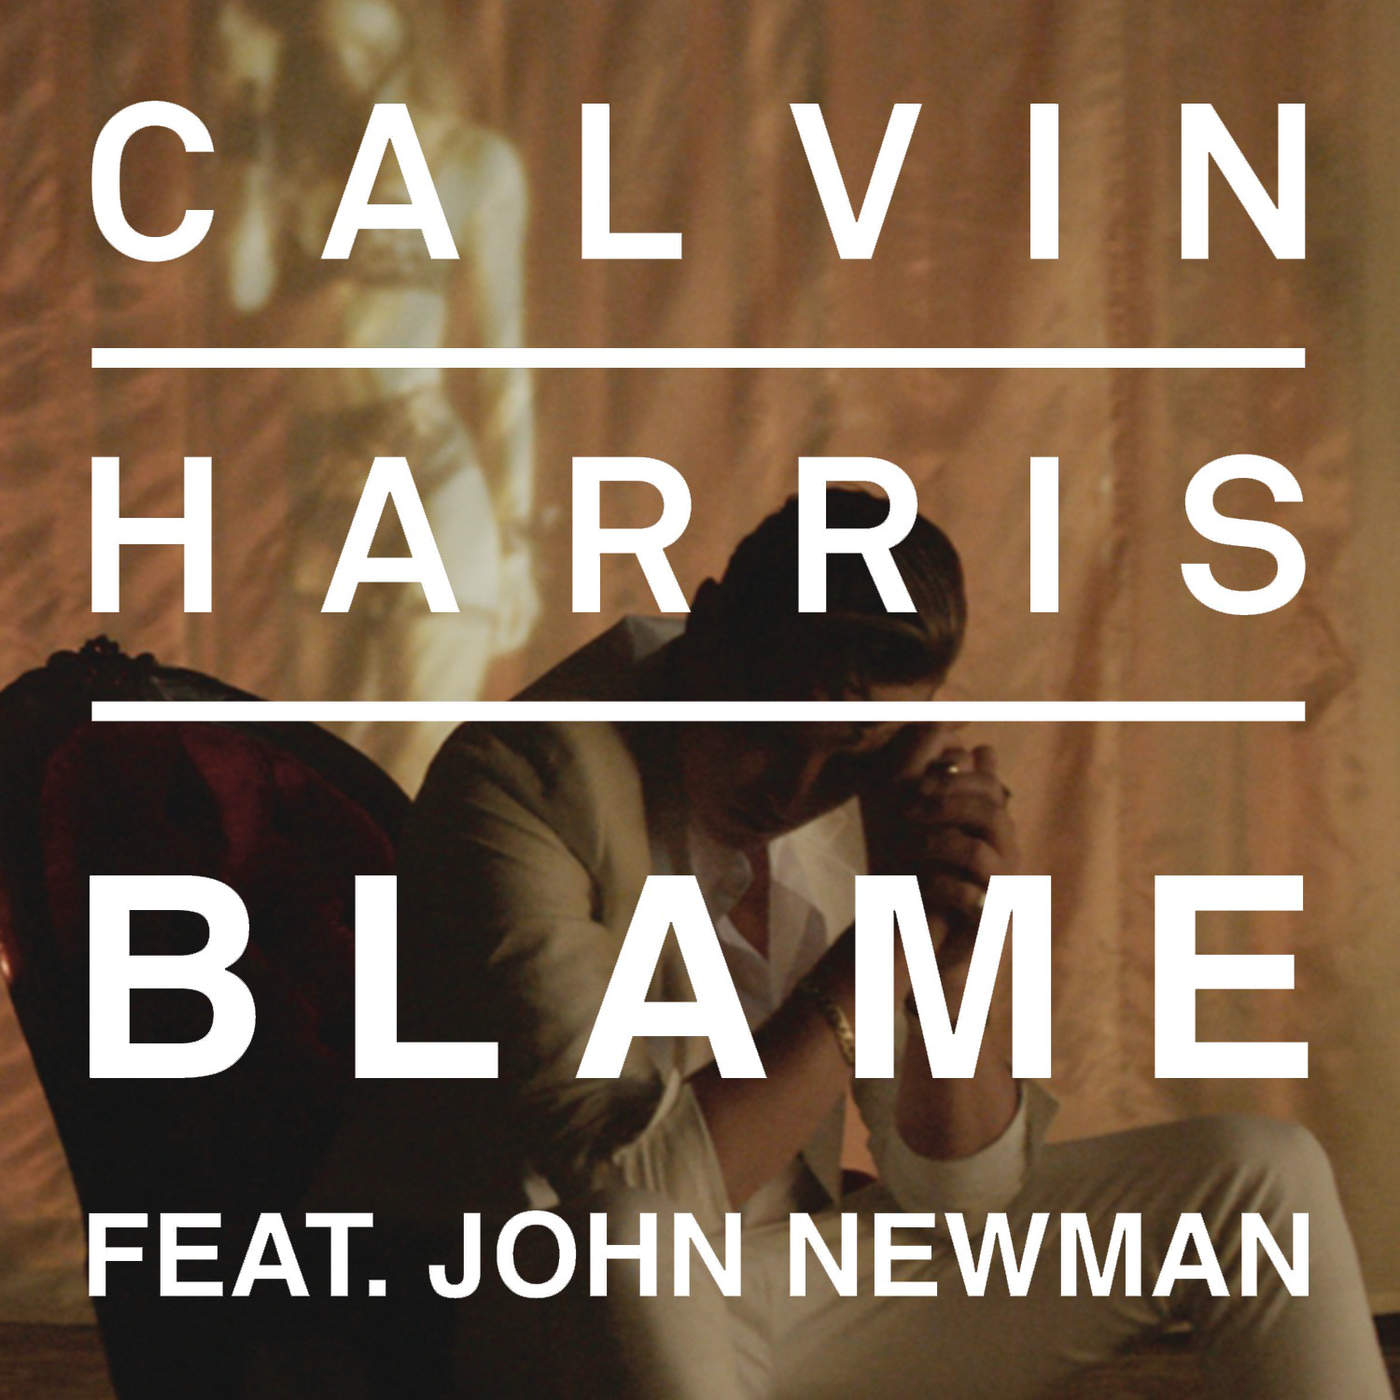 Calvin Harris - Blame - Single Cover